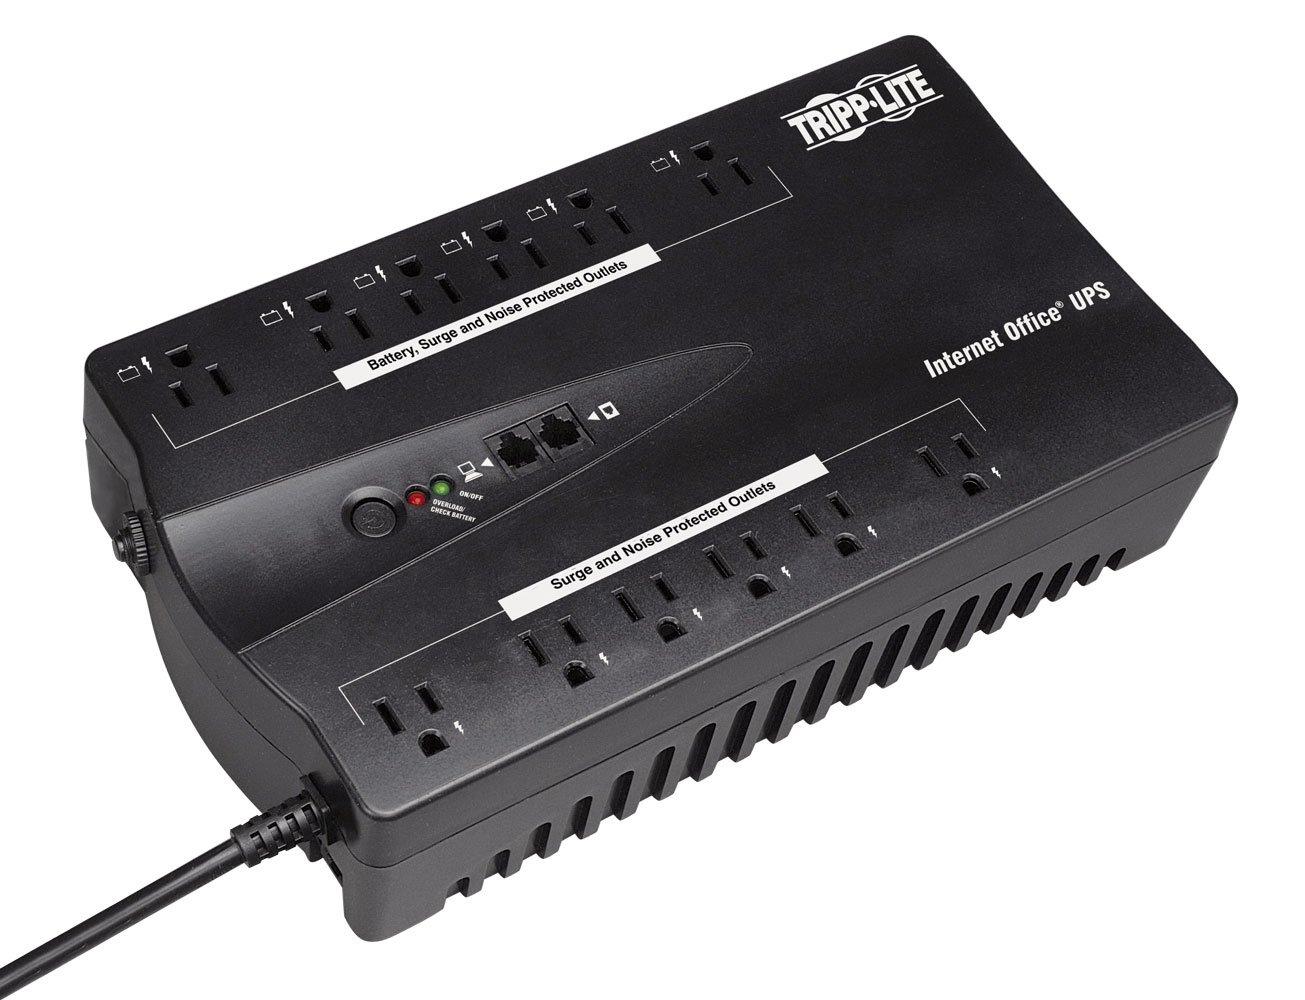 Tripp Lite 750VA UPS Desktop Battery Back Up, 12 Outlet, 450W 120V Standby, Ultra-Compact, USB (INTERNET750U)